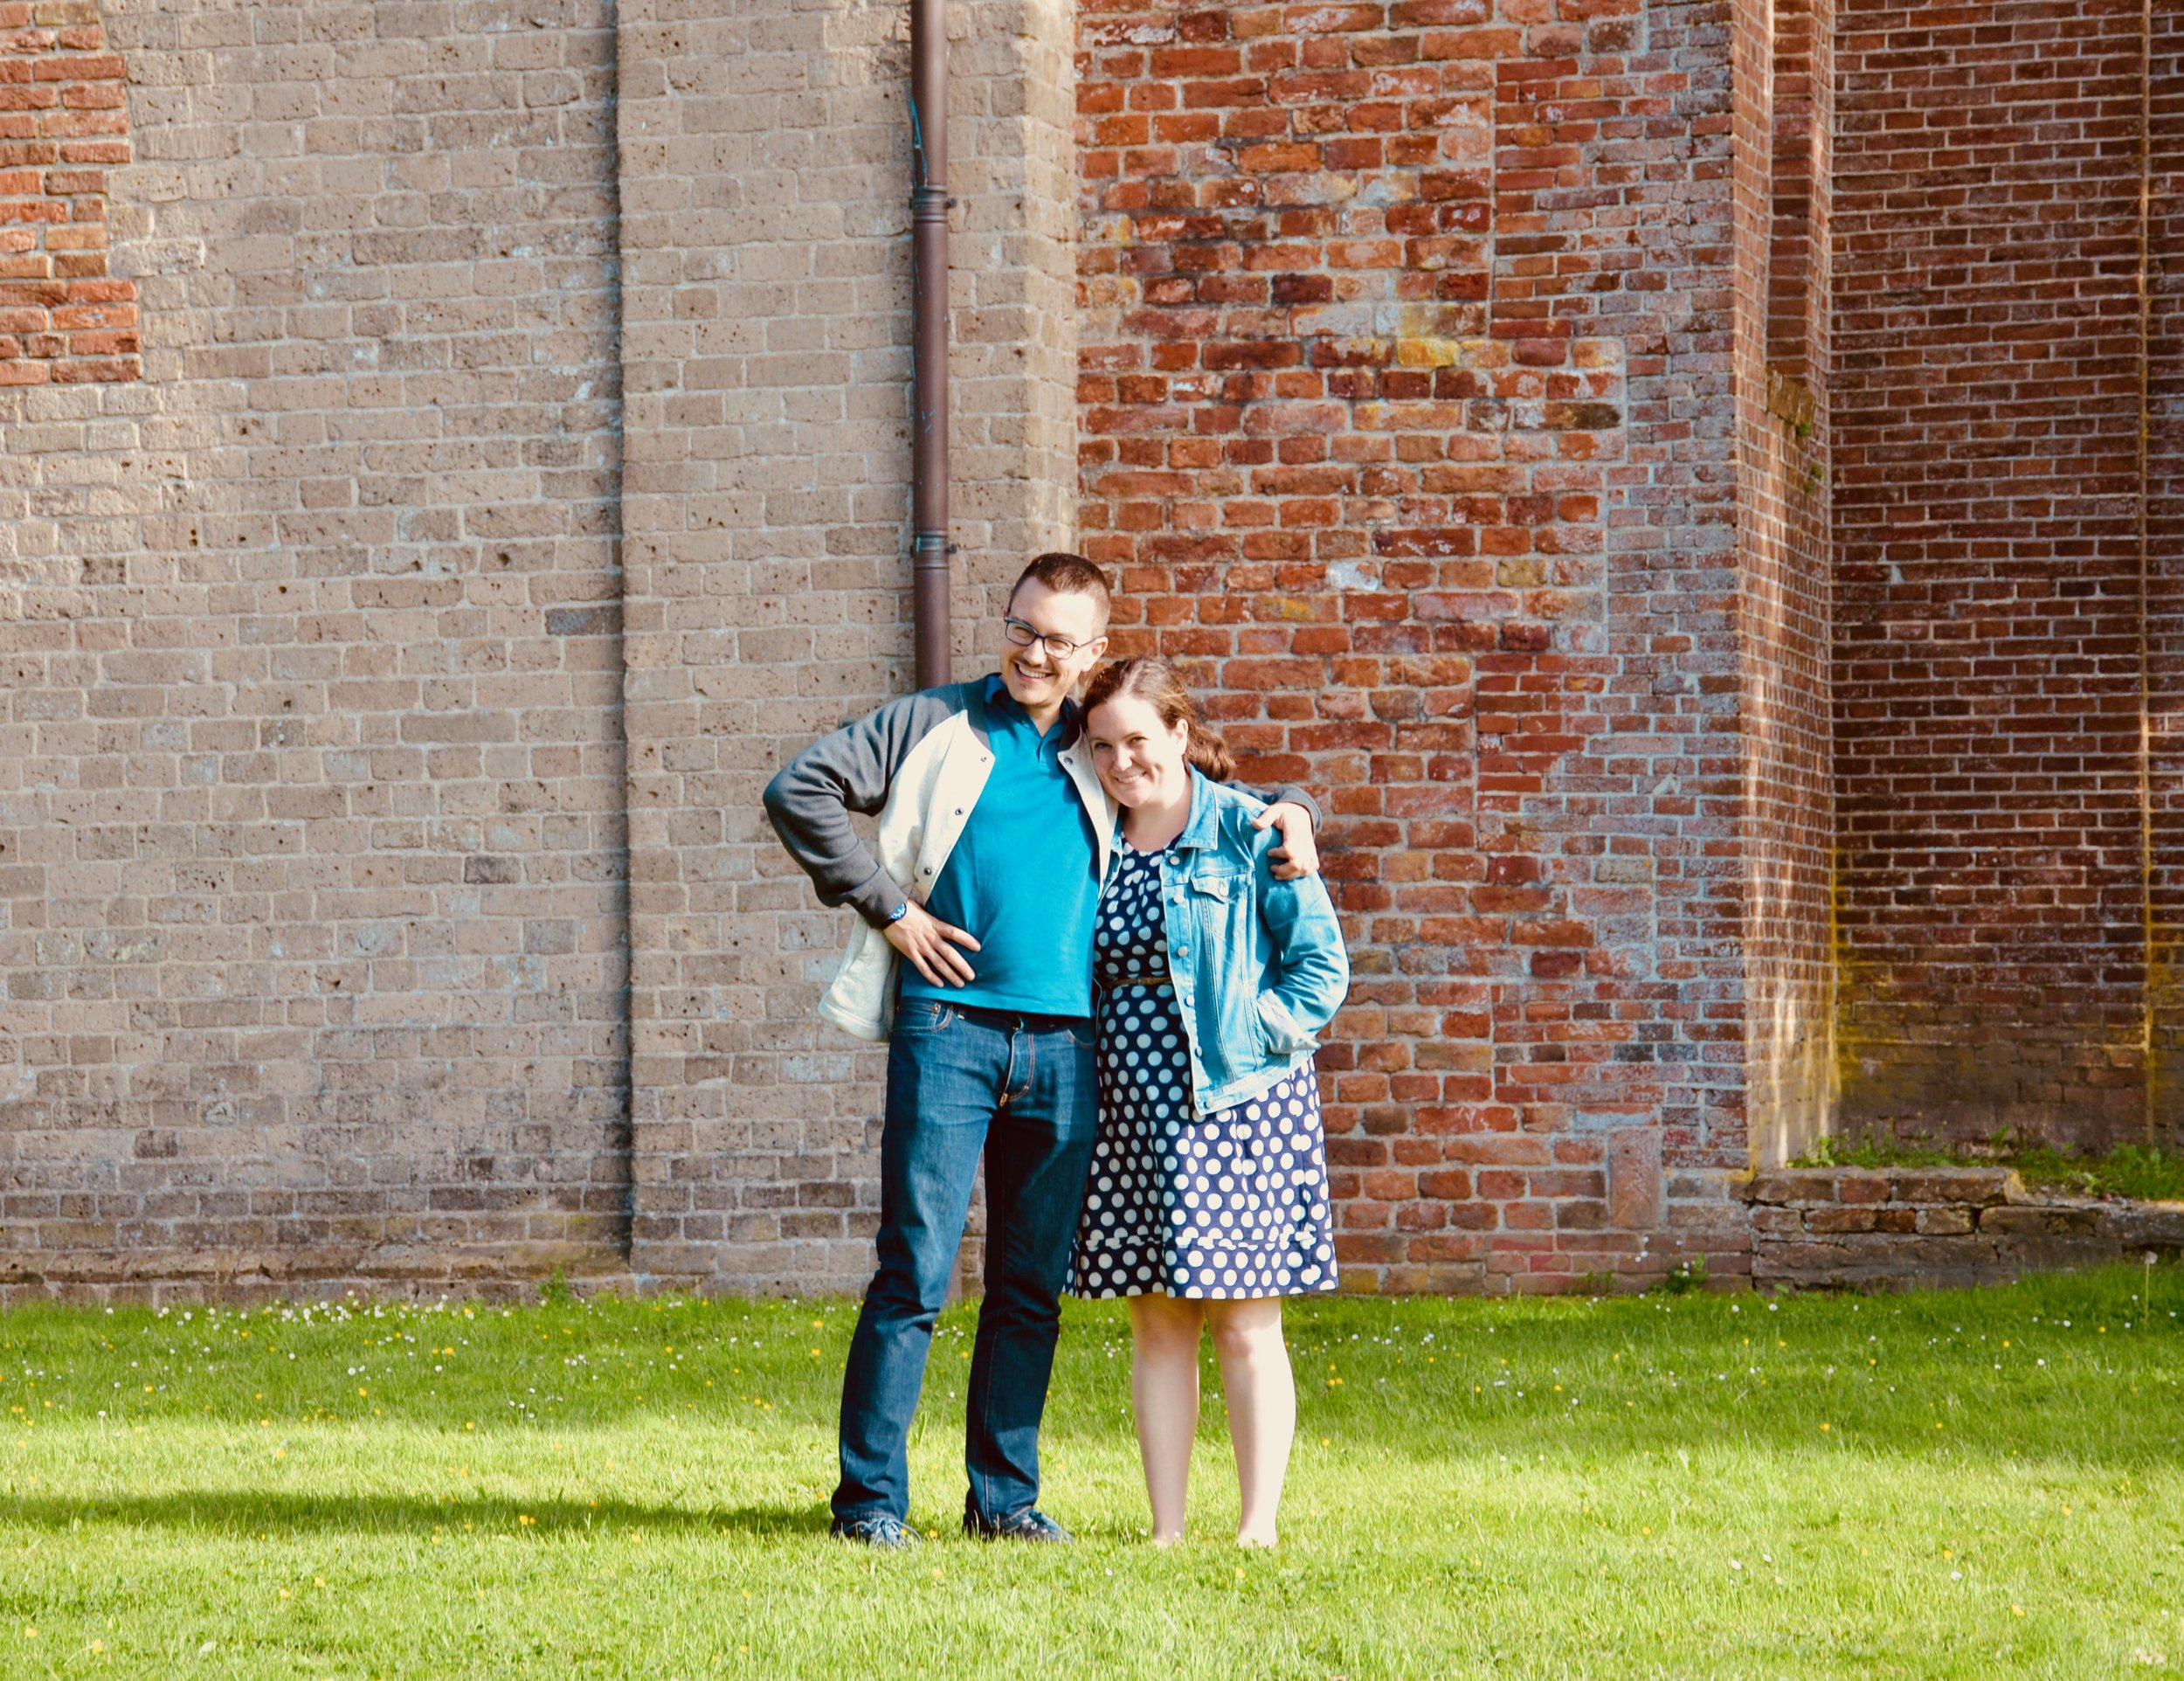 Corey De Tar and Chelsea Keating in Leens, Holland.